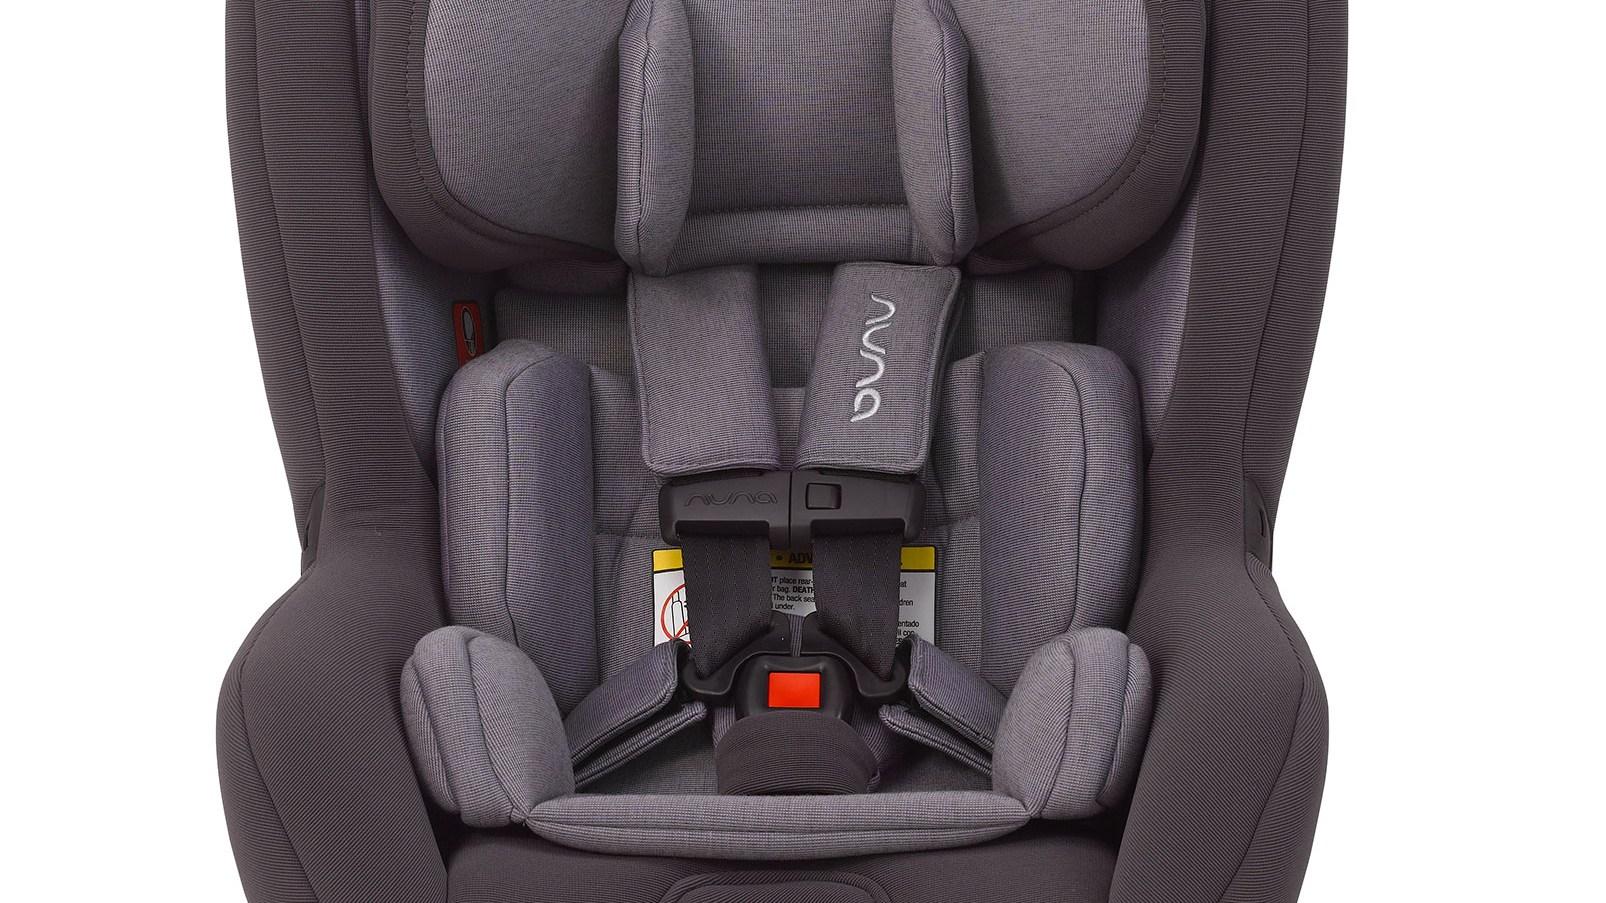 RAVA car seat